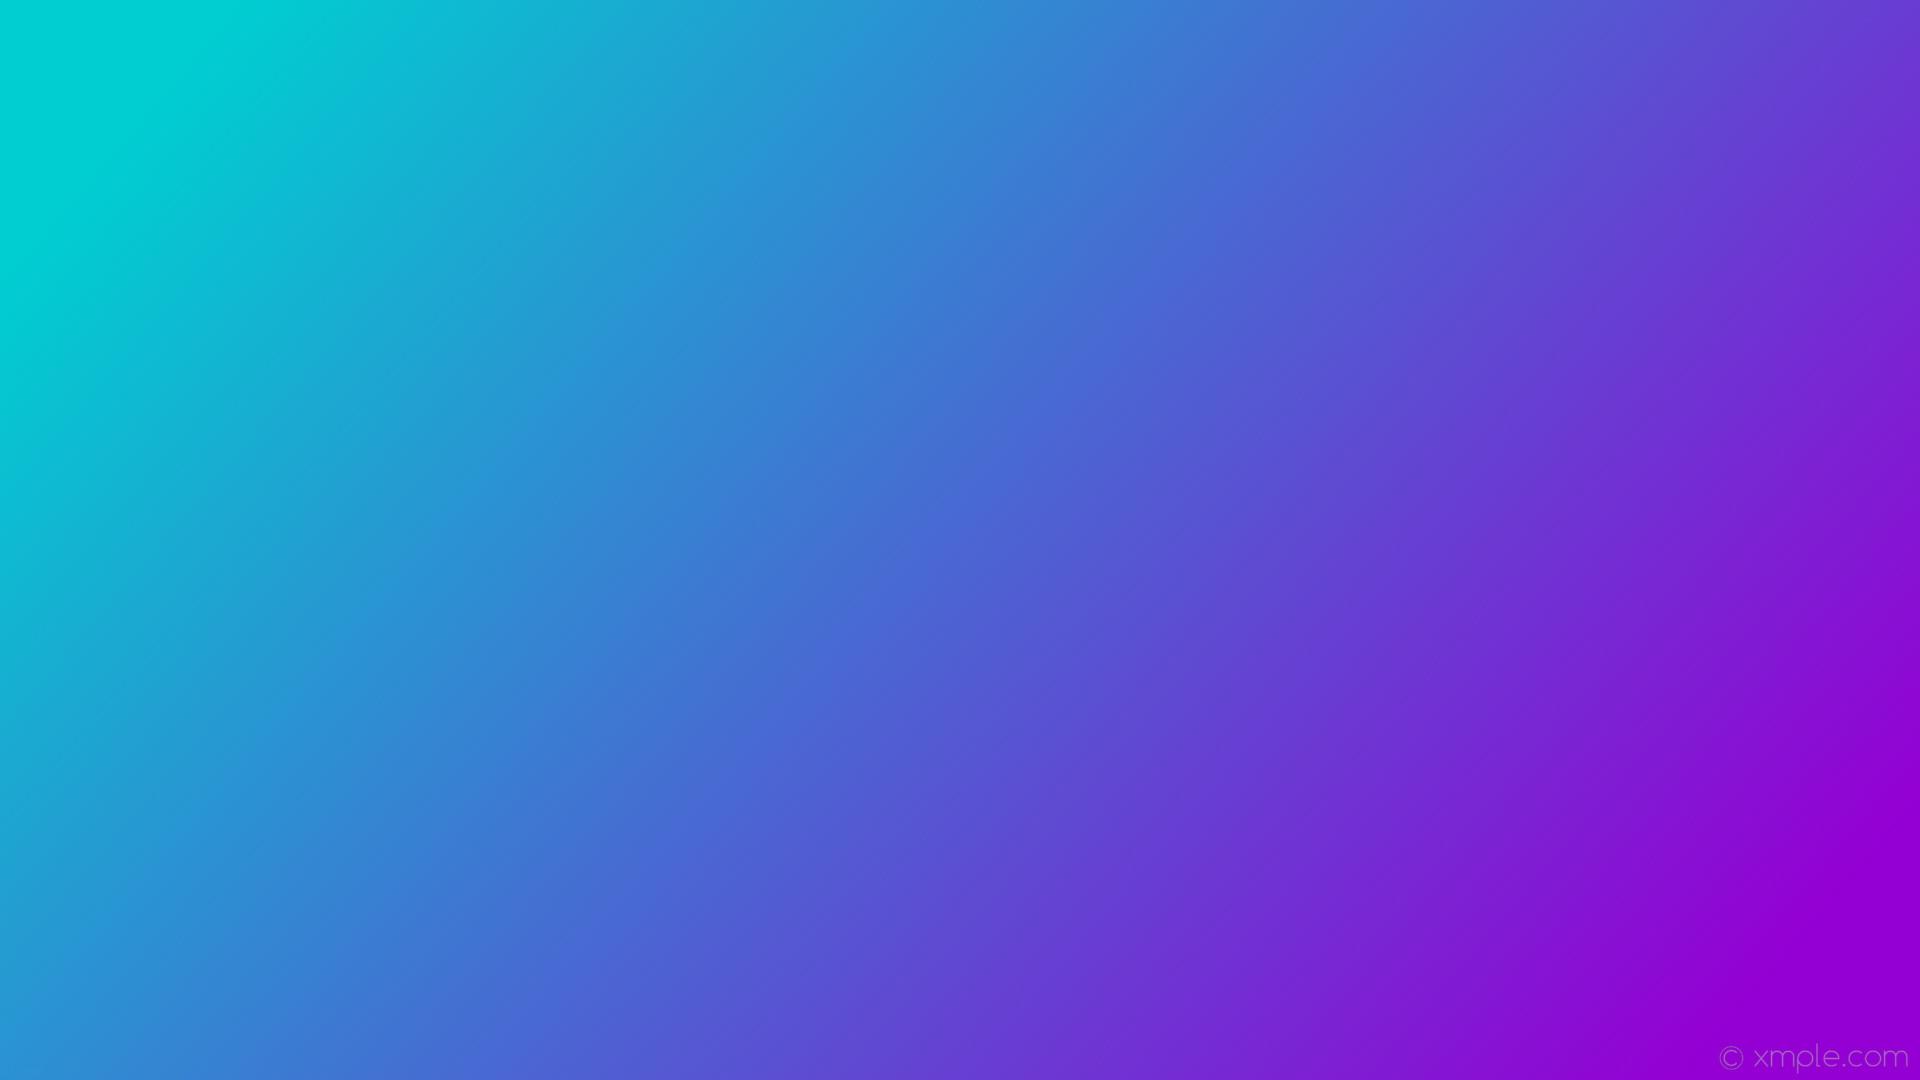 wallpaper gradient purple blue linear dark violet dark turquoise #9400d3  #00ced1 345°